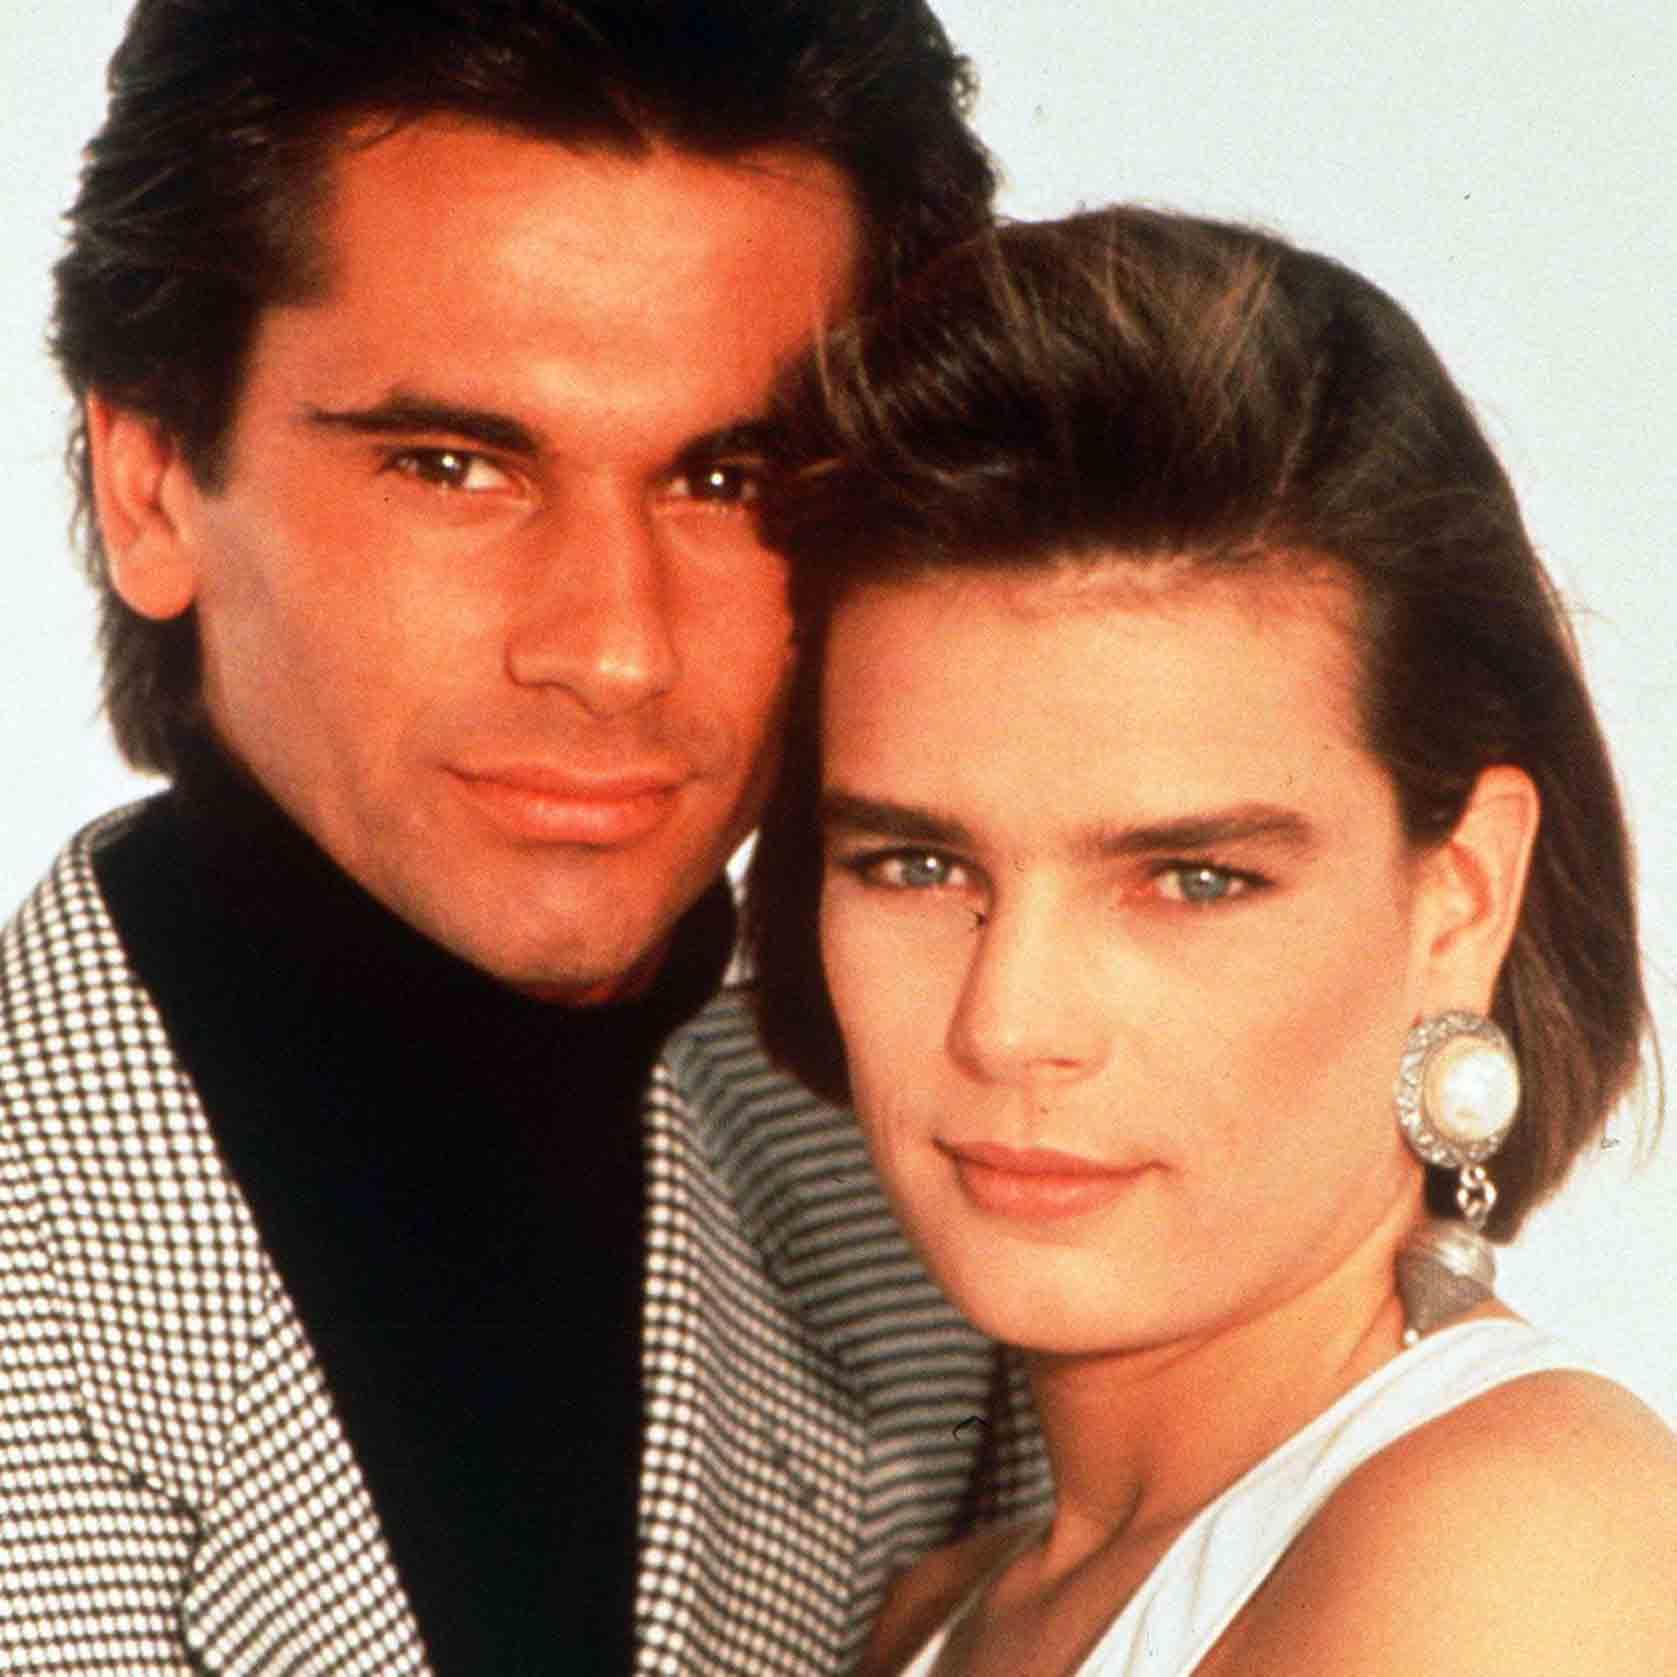 RETRO MONACO : La princesse Stephanie et Jean-Yves Le Fur